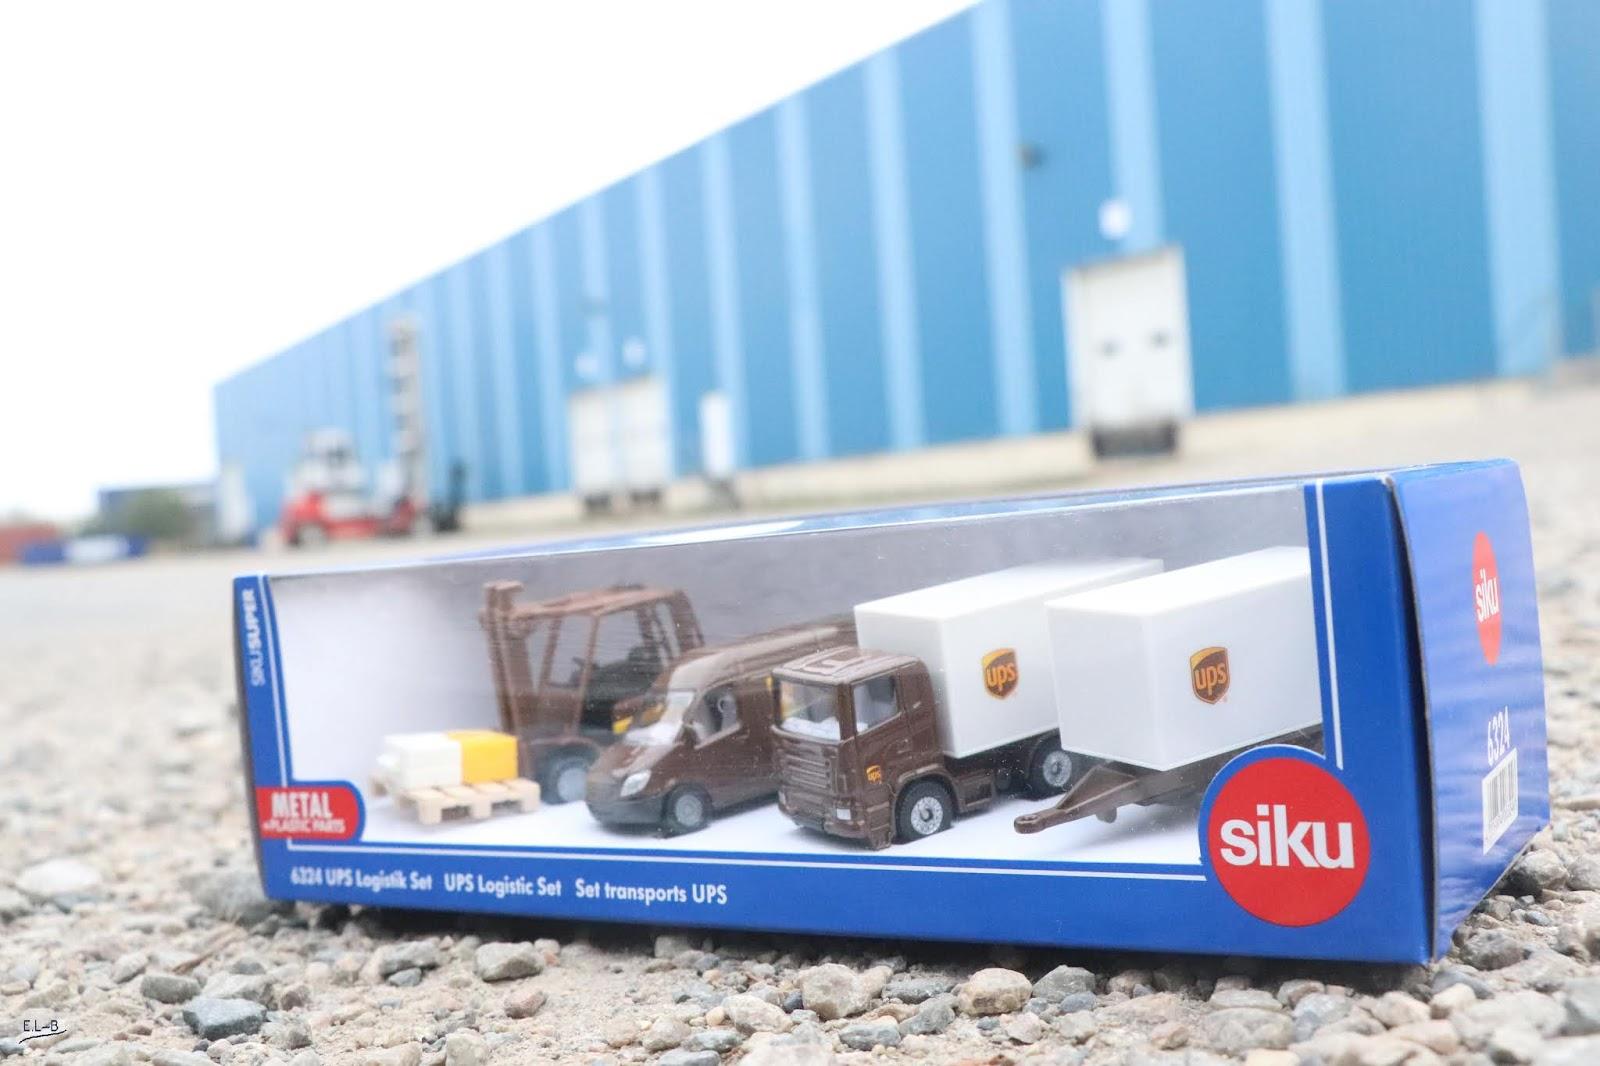 Set Coffret Logistik Marron 6324 Ups Voitures Siku VSLqpGUMz